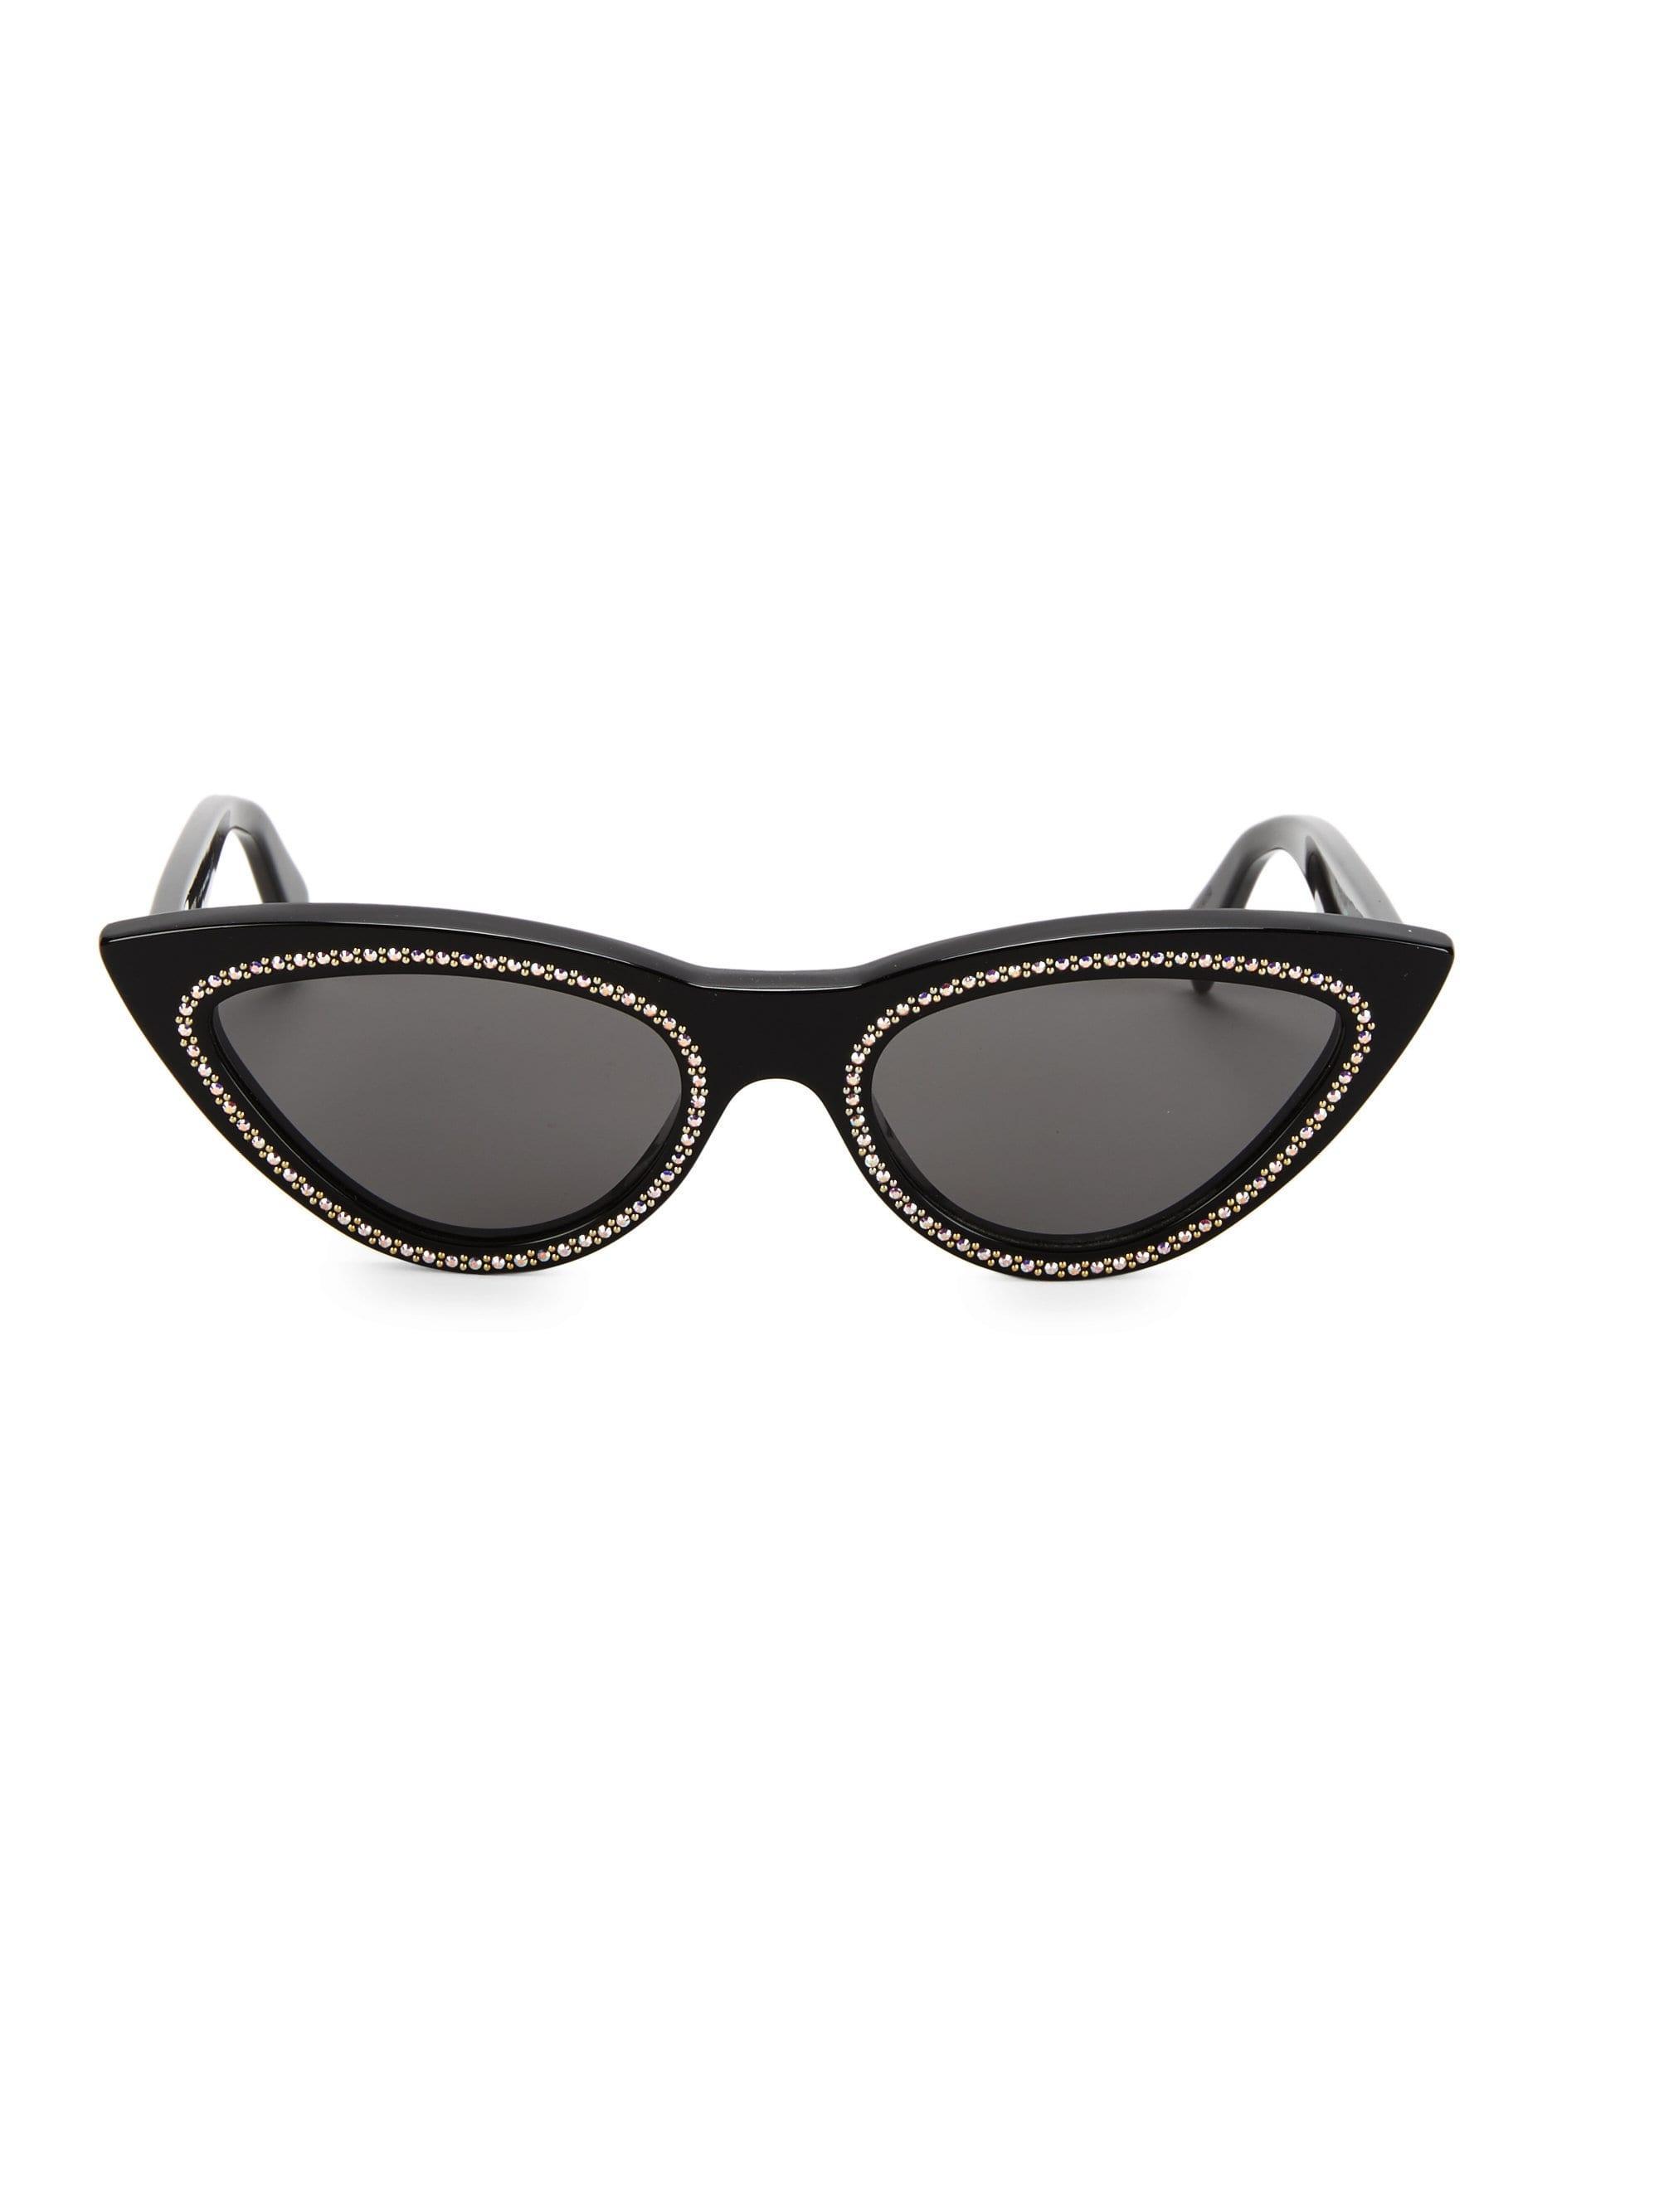 a4d0b1471d380 Céline 56mm Crystal-studded Cateye Sunglasses in Black - Lyst